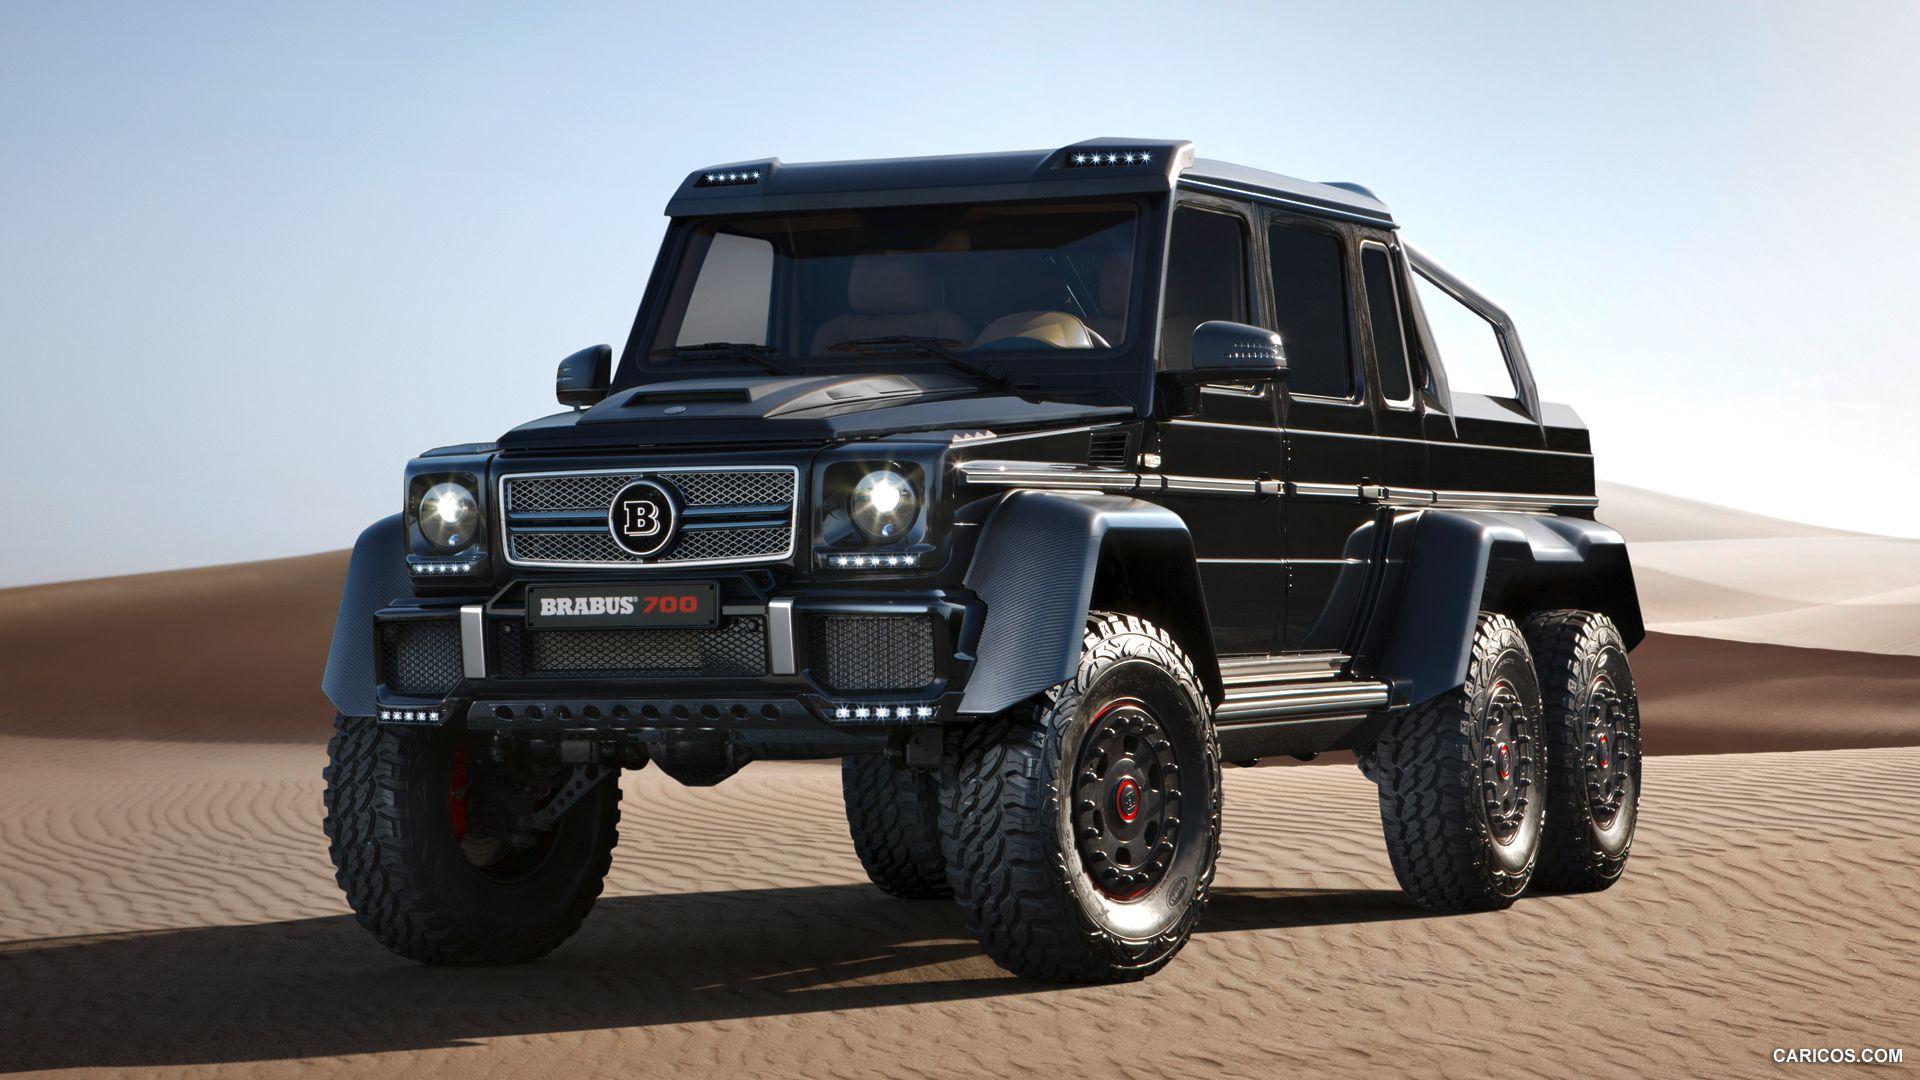 2013 Brabus B63s 700 6x6 Based On Mercedes Benz G63 Amg 6x6